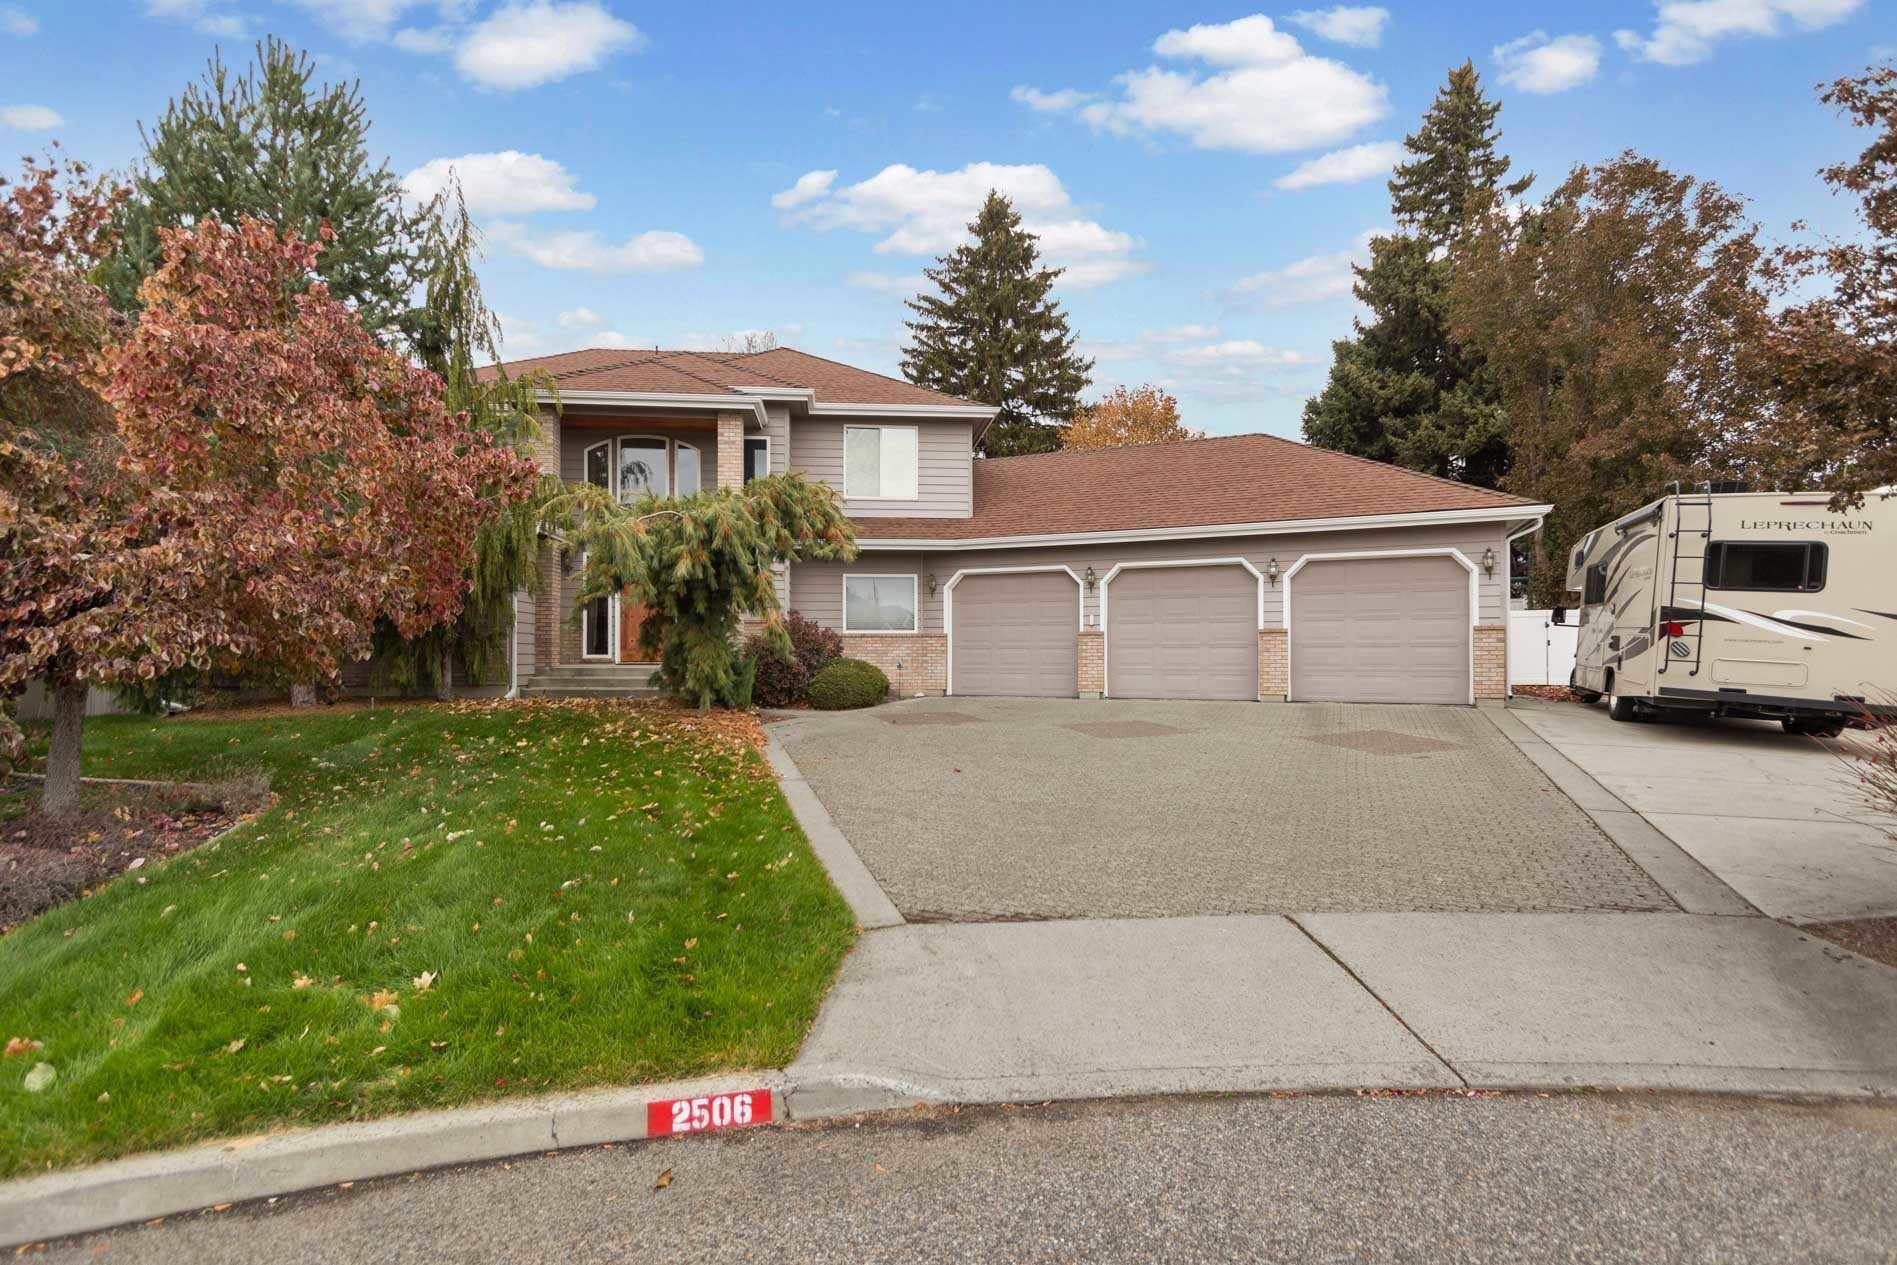 2506 S Bolivar Ct, Spokane Valley, WA 99037 - #: 202110285